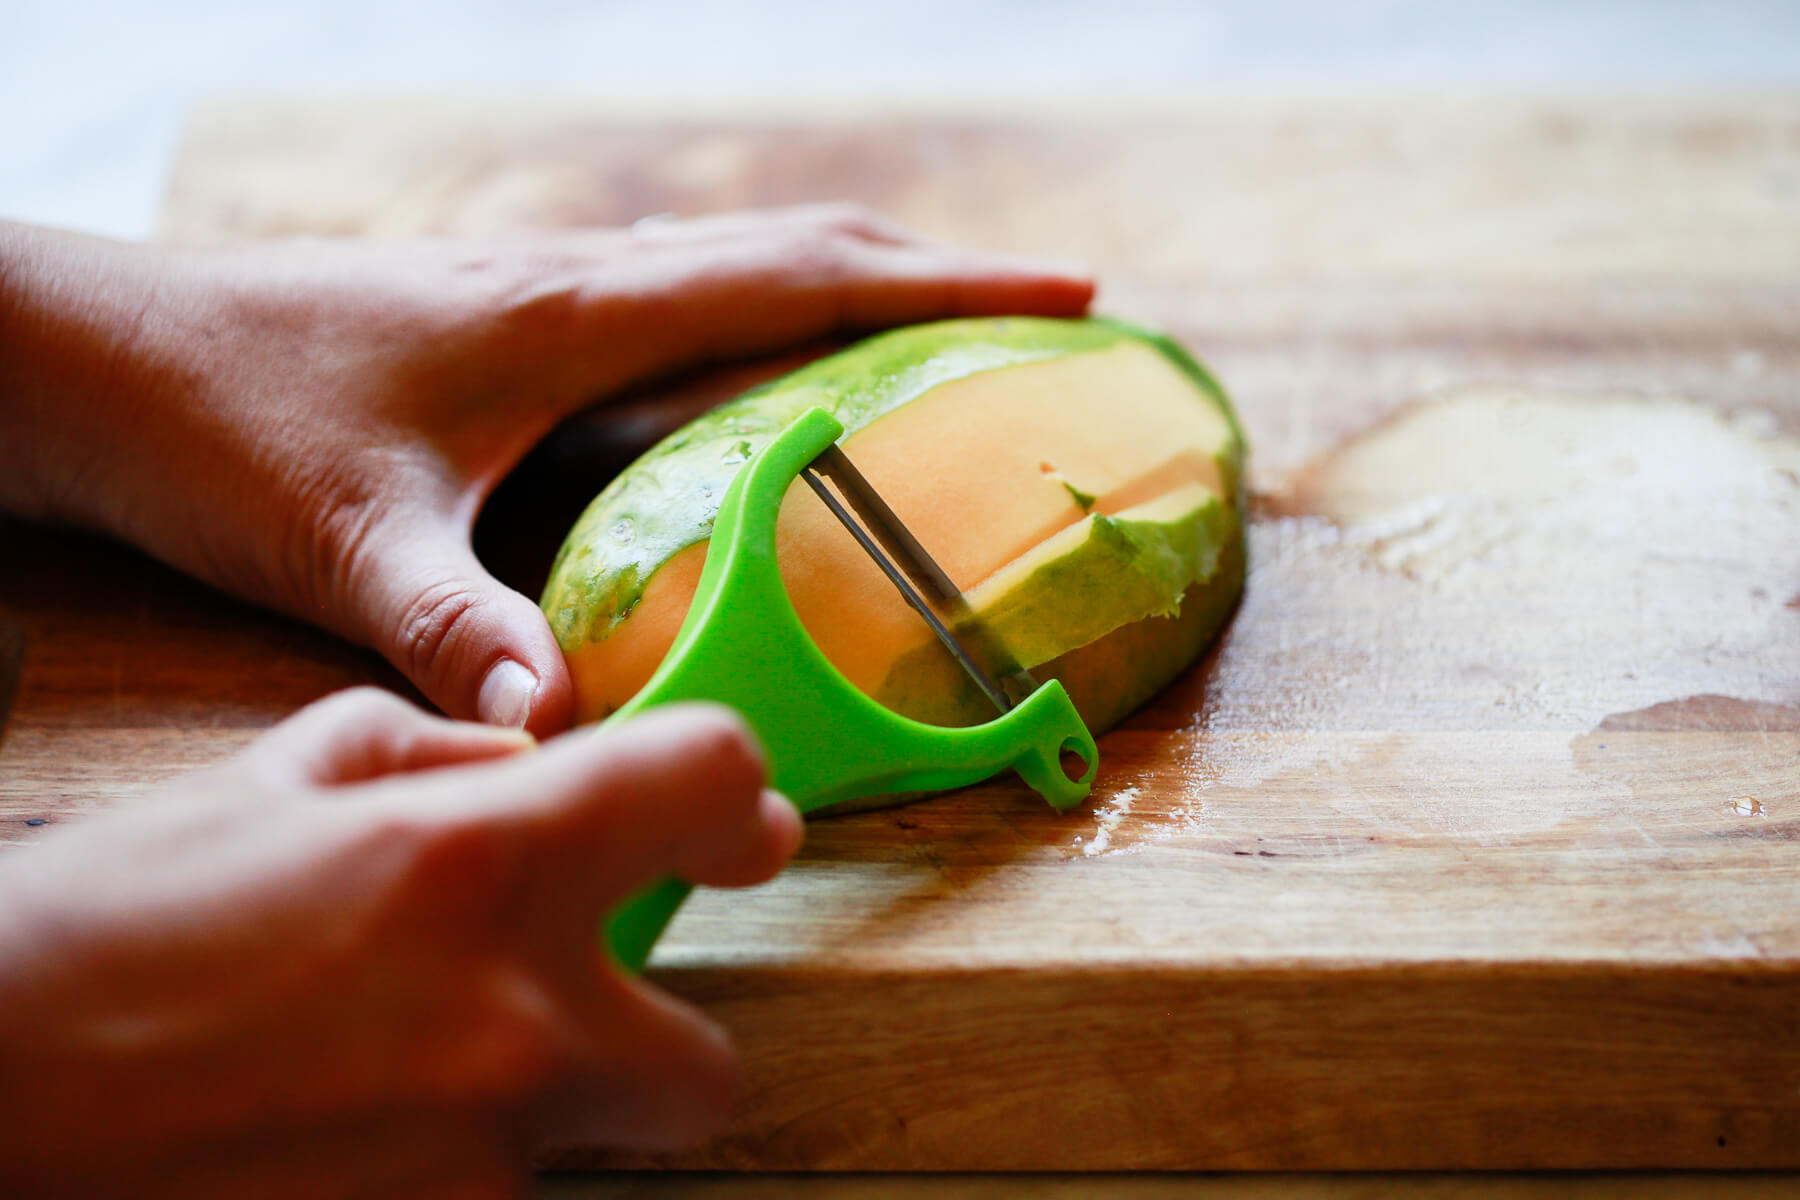 A green vegetable peeler is used to peel a papaya.